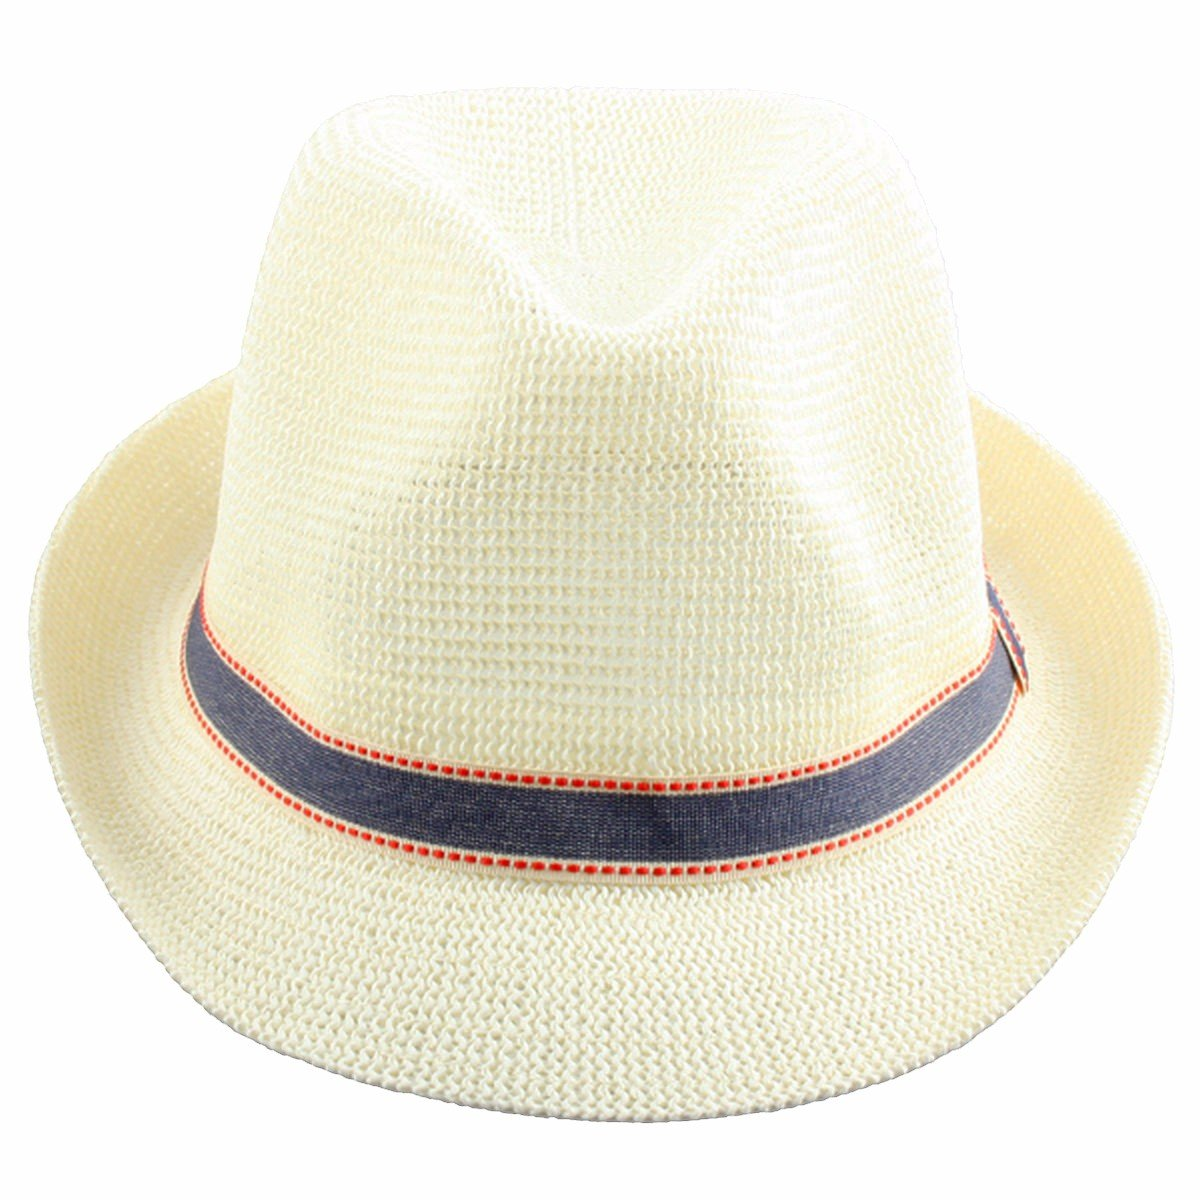 6c6f1333801105 Fedoras Beathable Straw Panama Hat AM0401-2 Samtree Fedora Hats for Women  Men